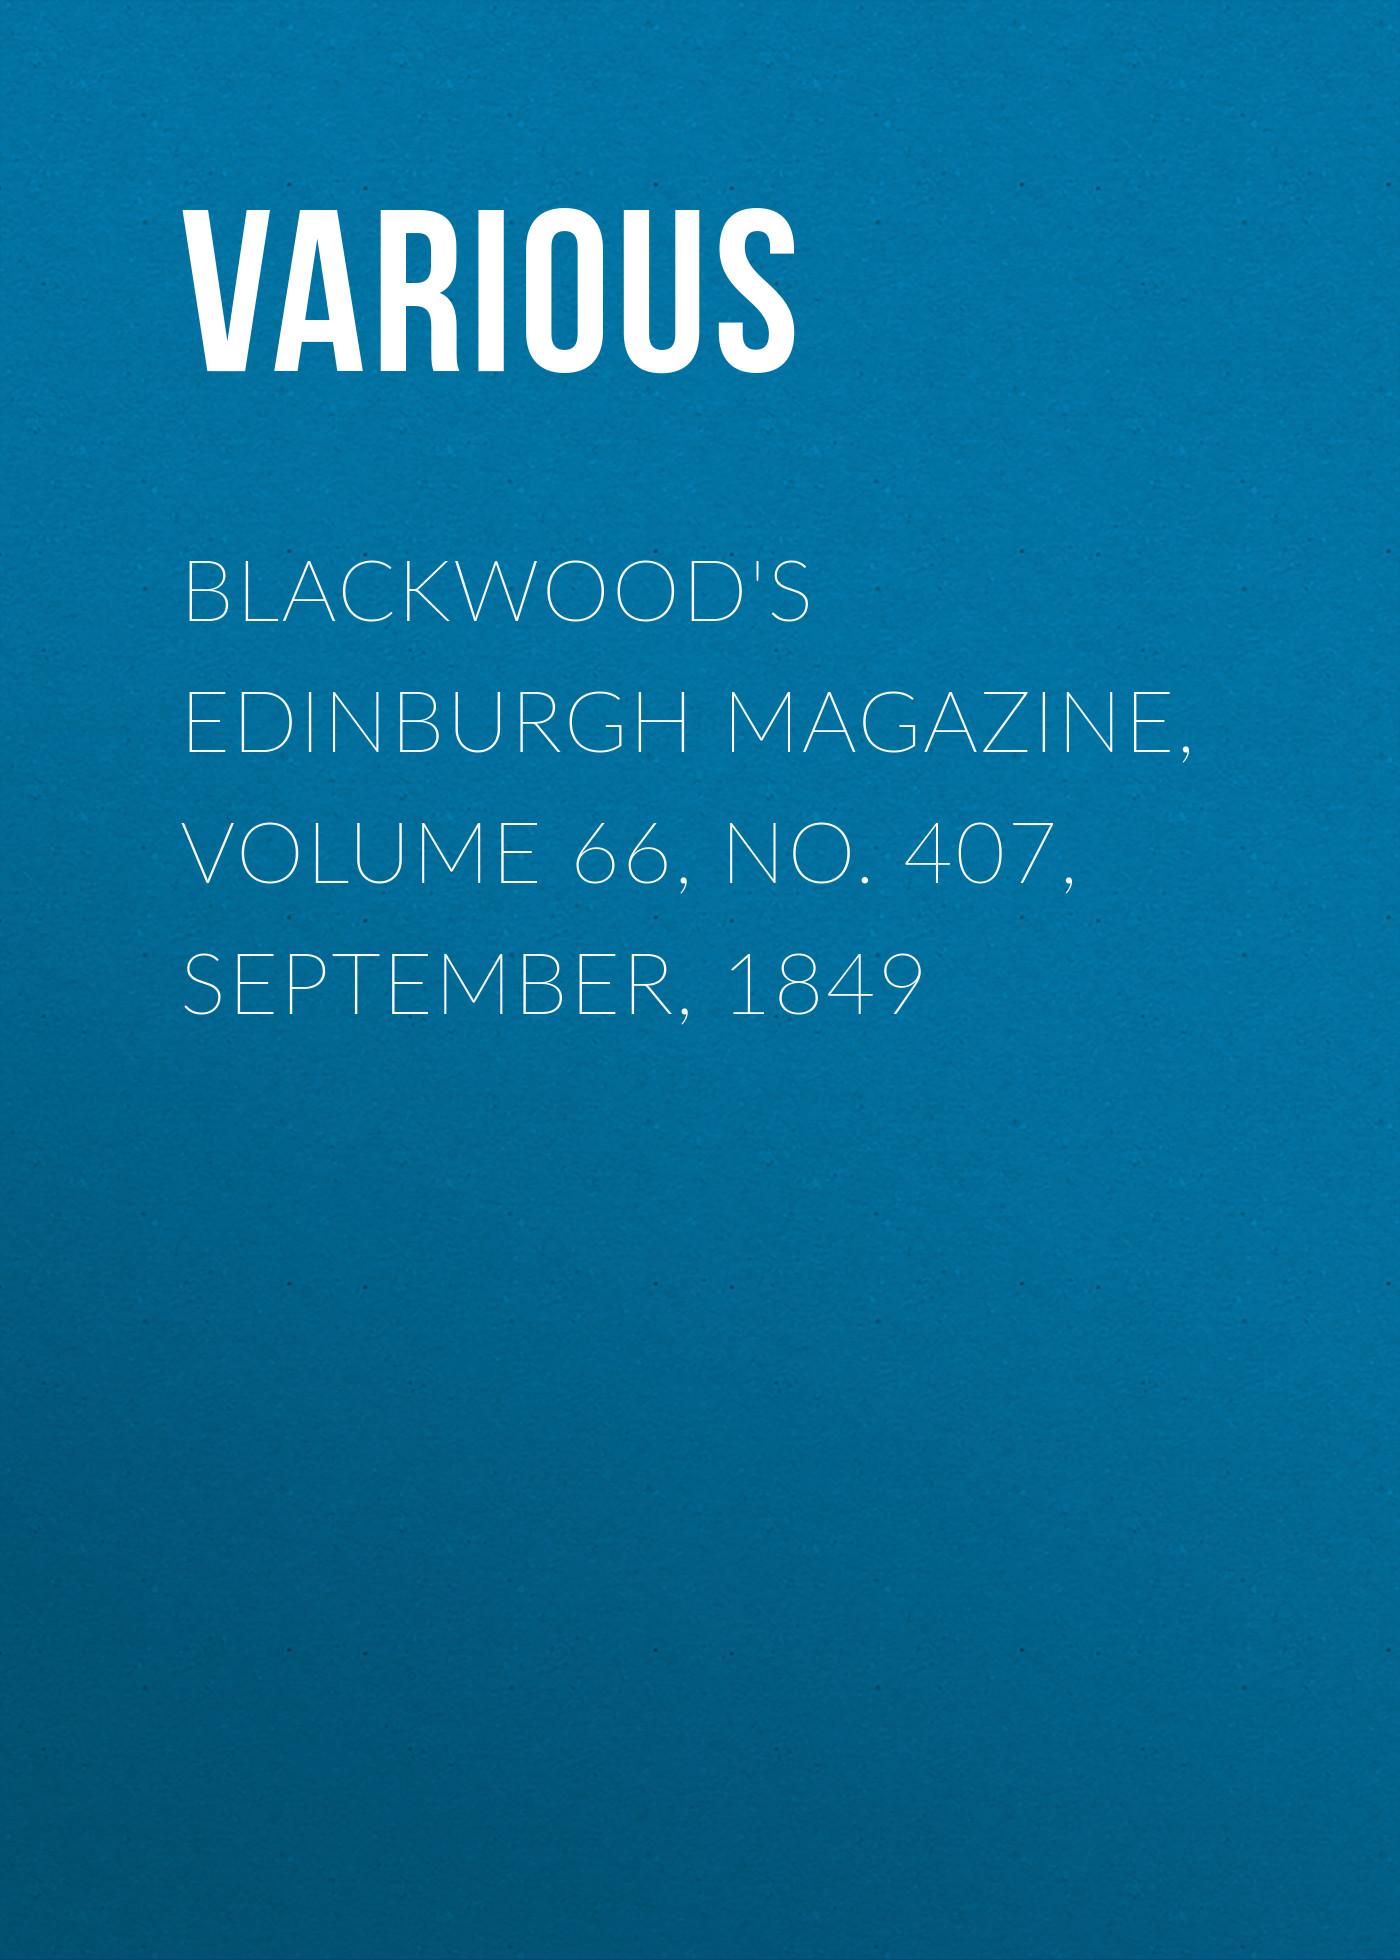 Various Blackwood's Edinburgh Magazine, Volume 66, No. 407, September, 1849